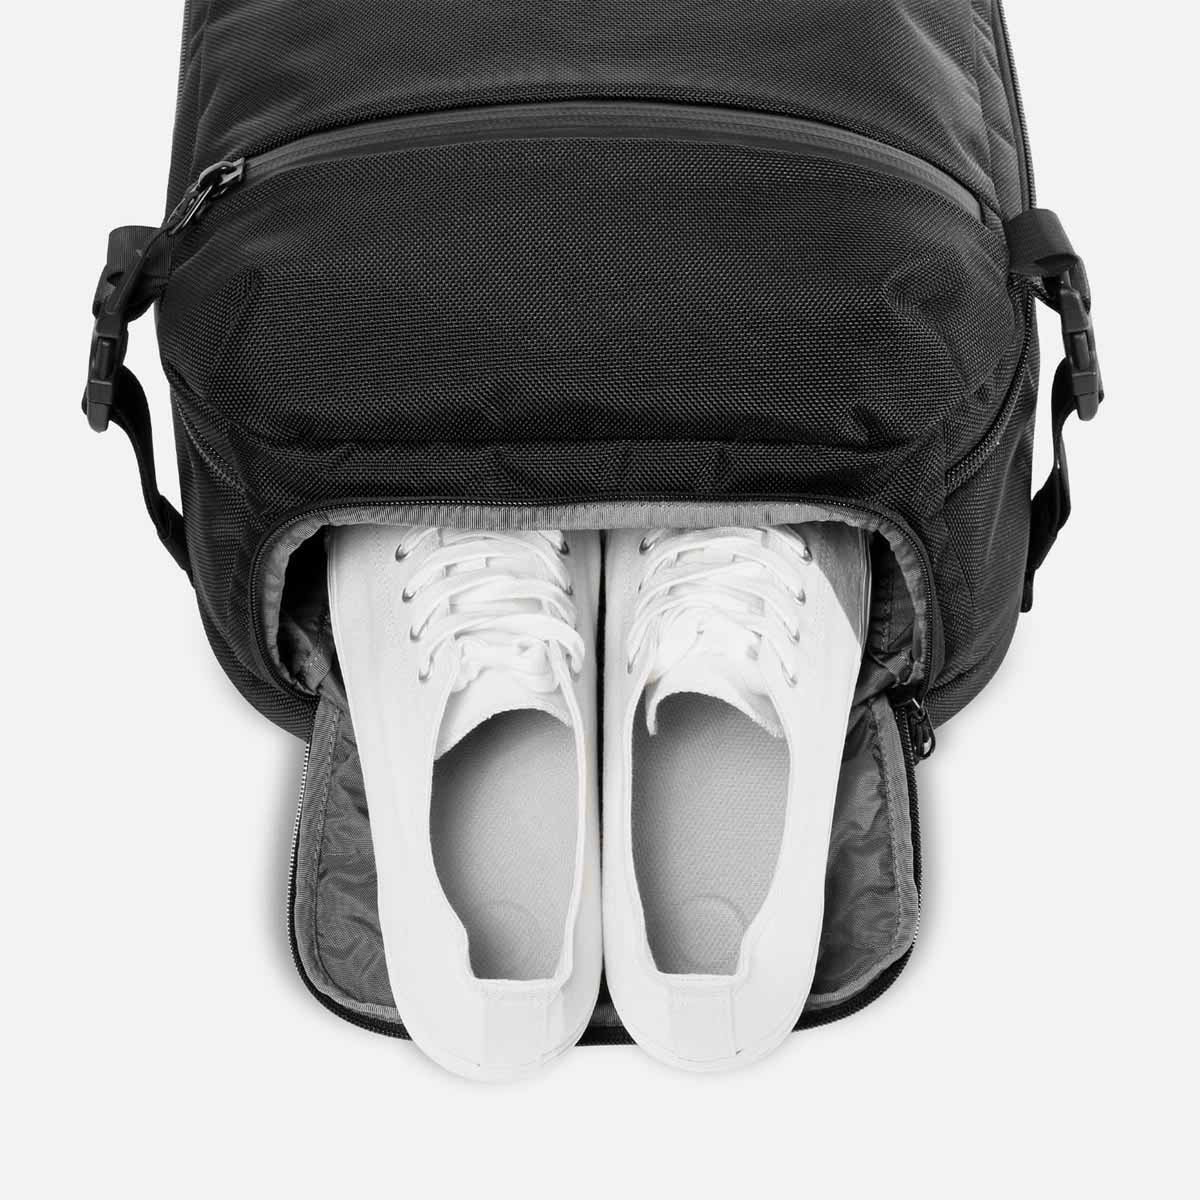 21003_tp_black_shoes.jpg